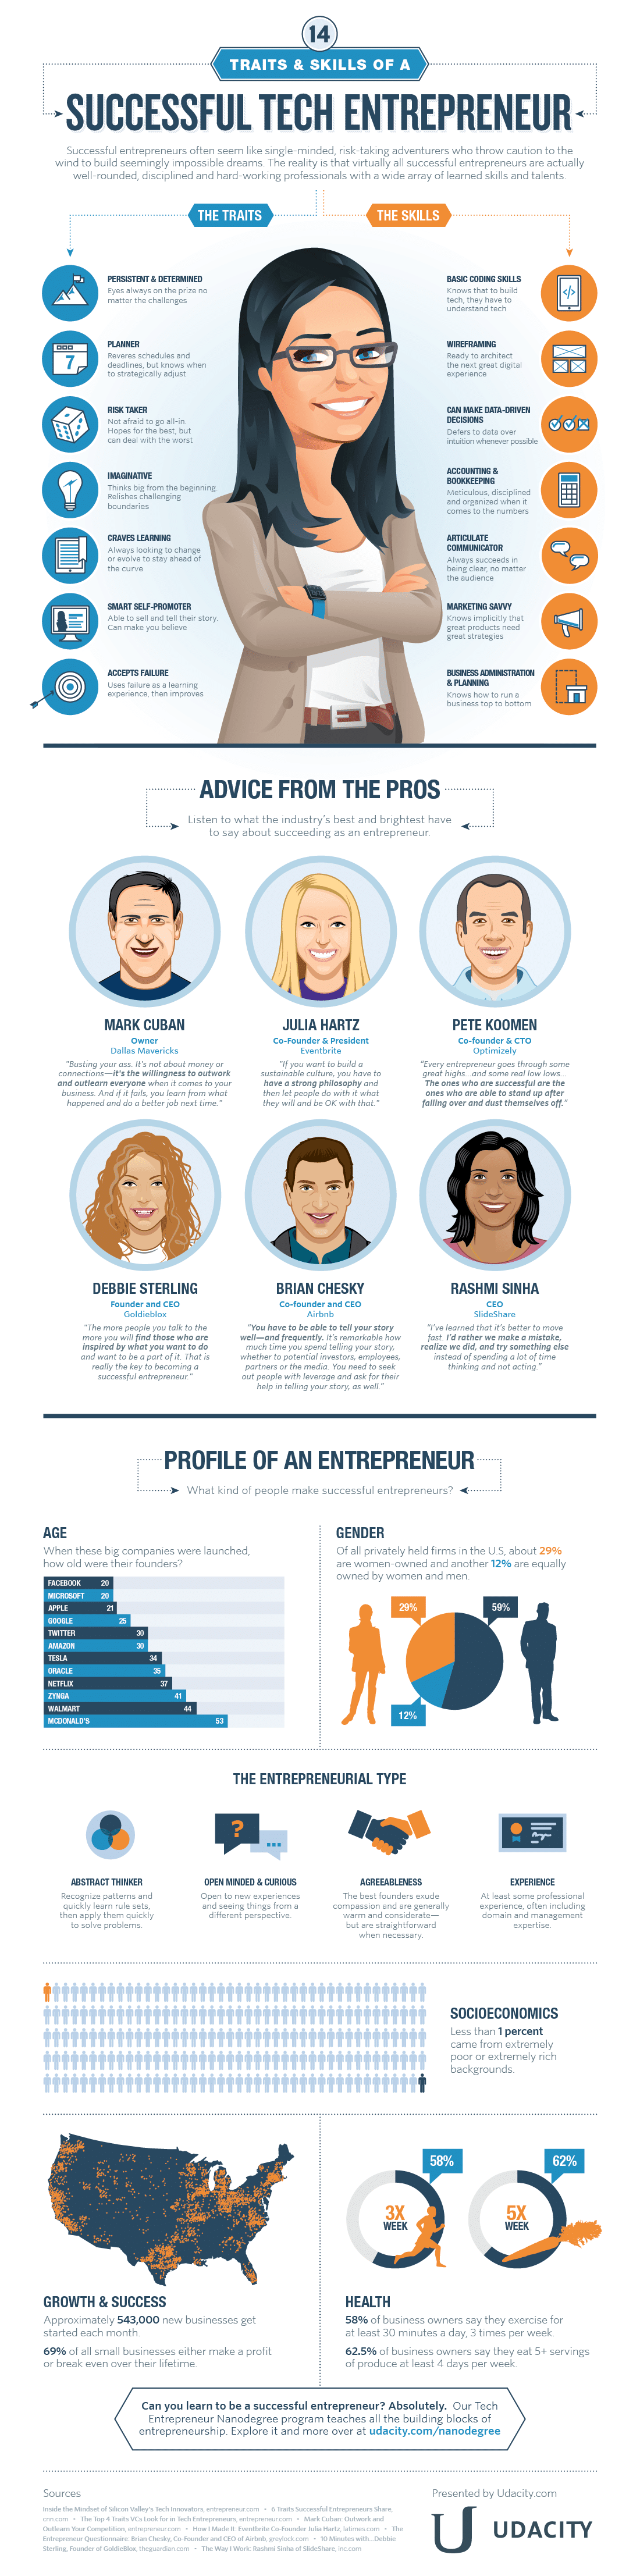 Traits_Skills_Tech_Entrepreneur_Infographic_Udacity